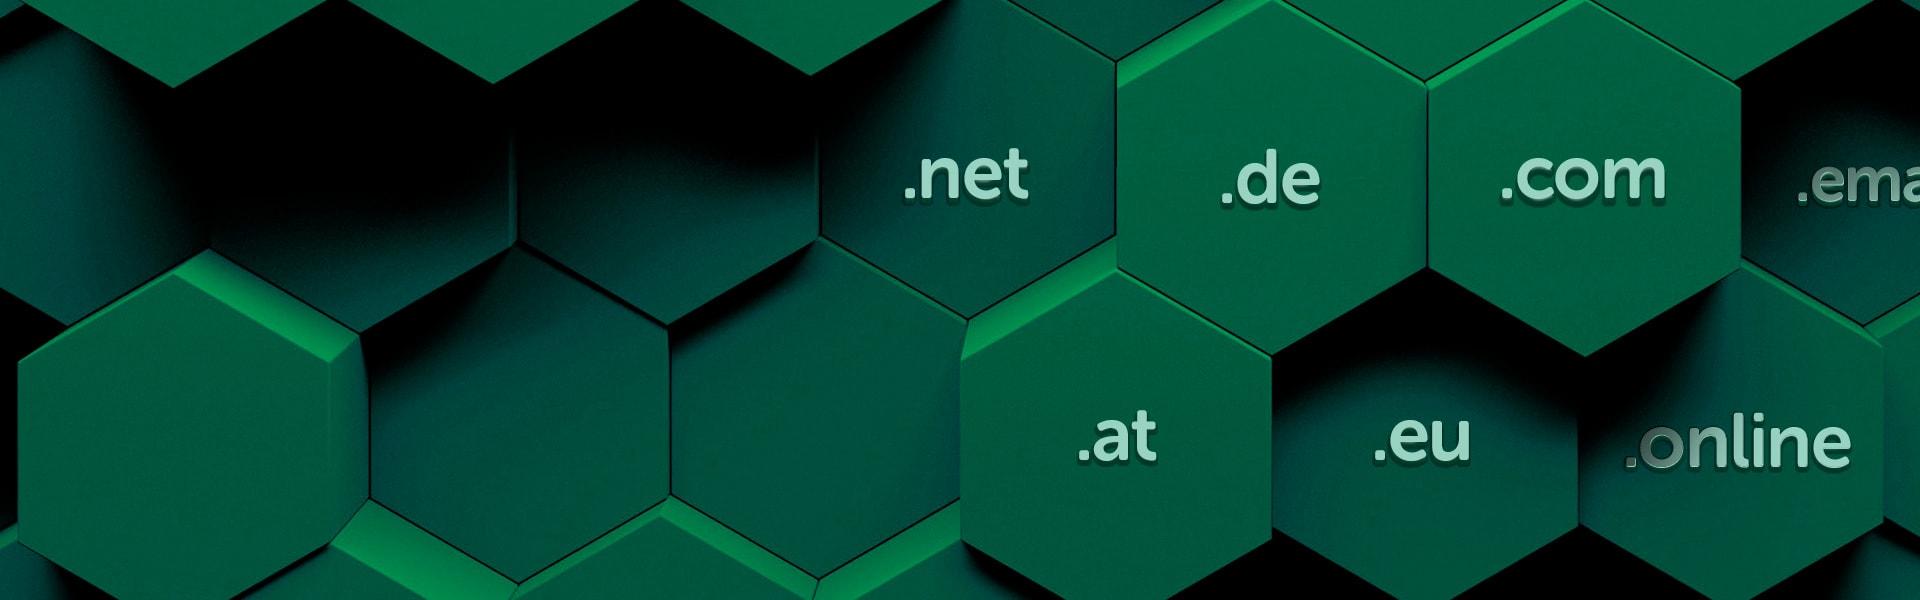 HeaderImage Domains